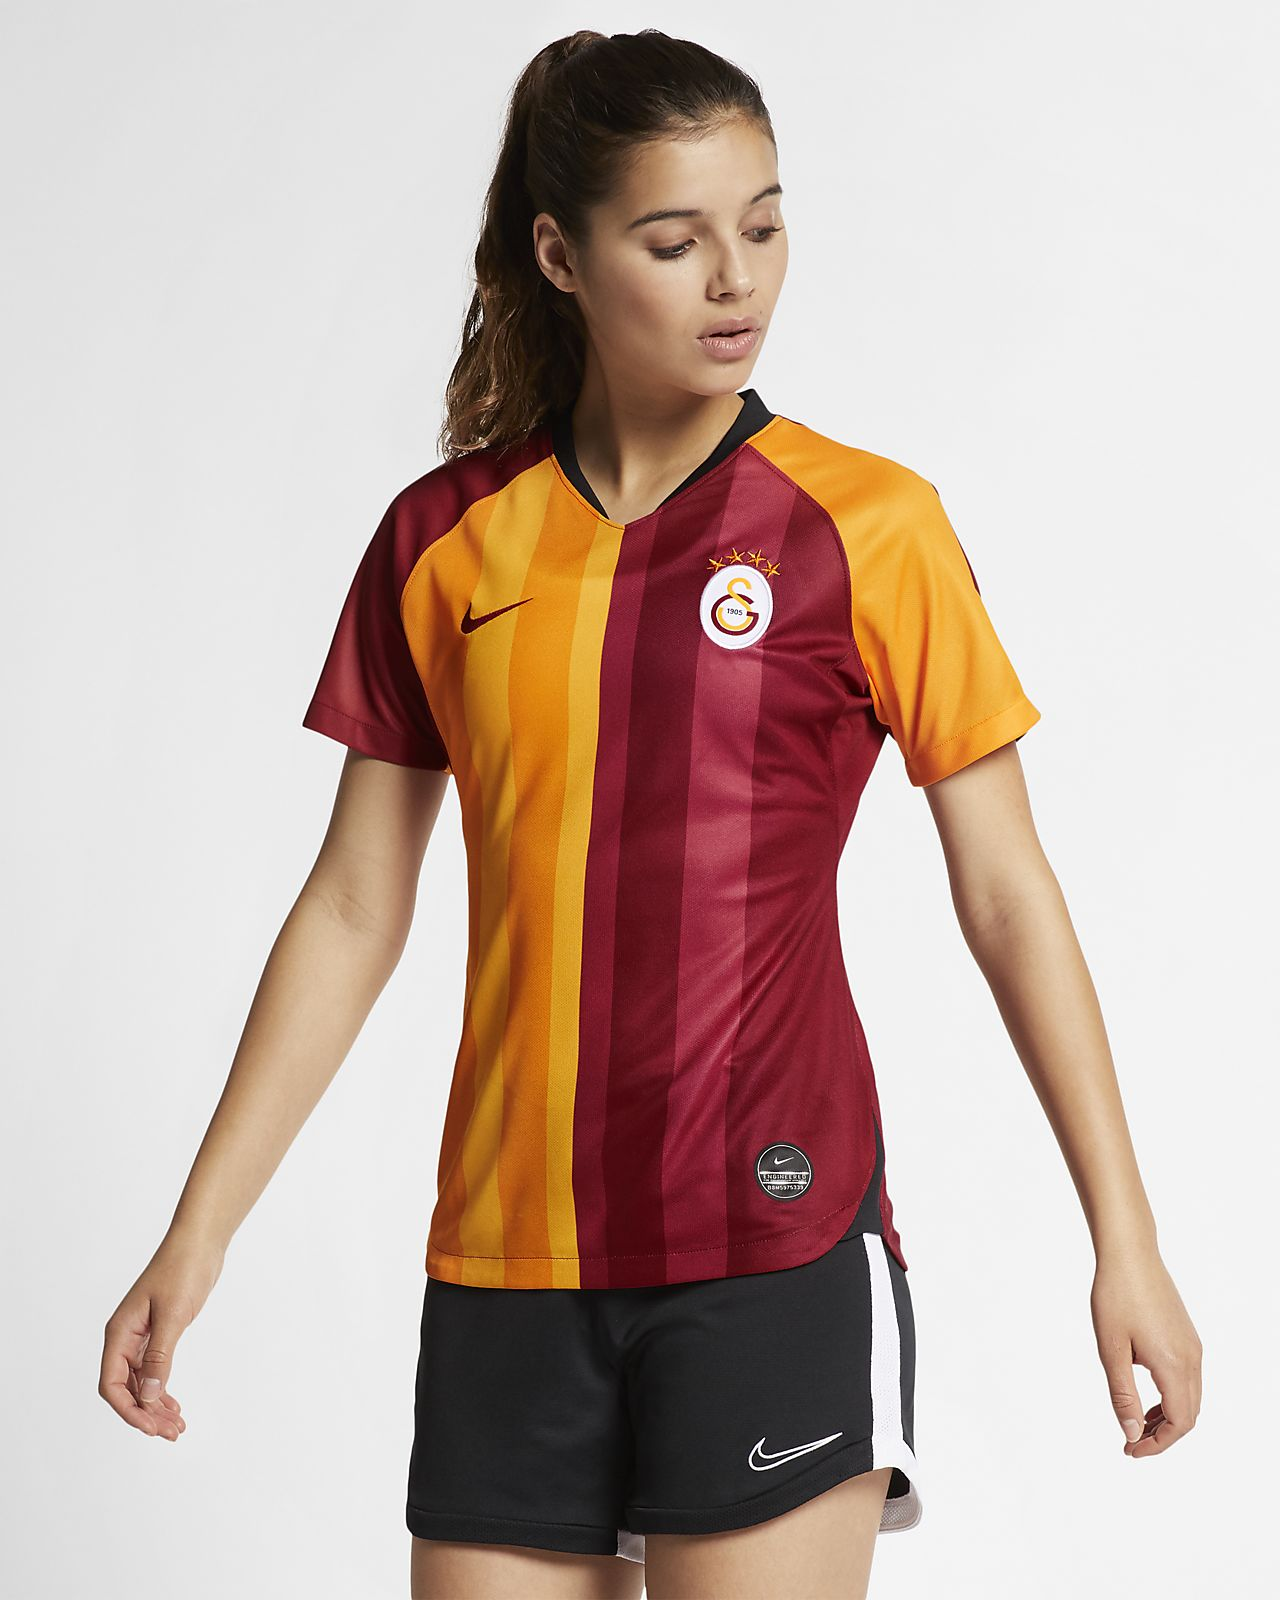 Damen Fußballtrikot Home 201920 Stadium Galatasaray 6Yv7yfgb